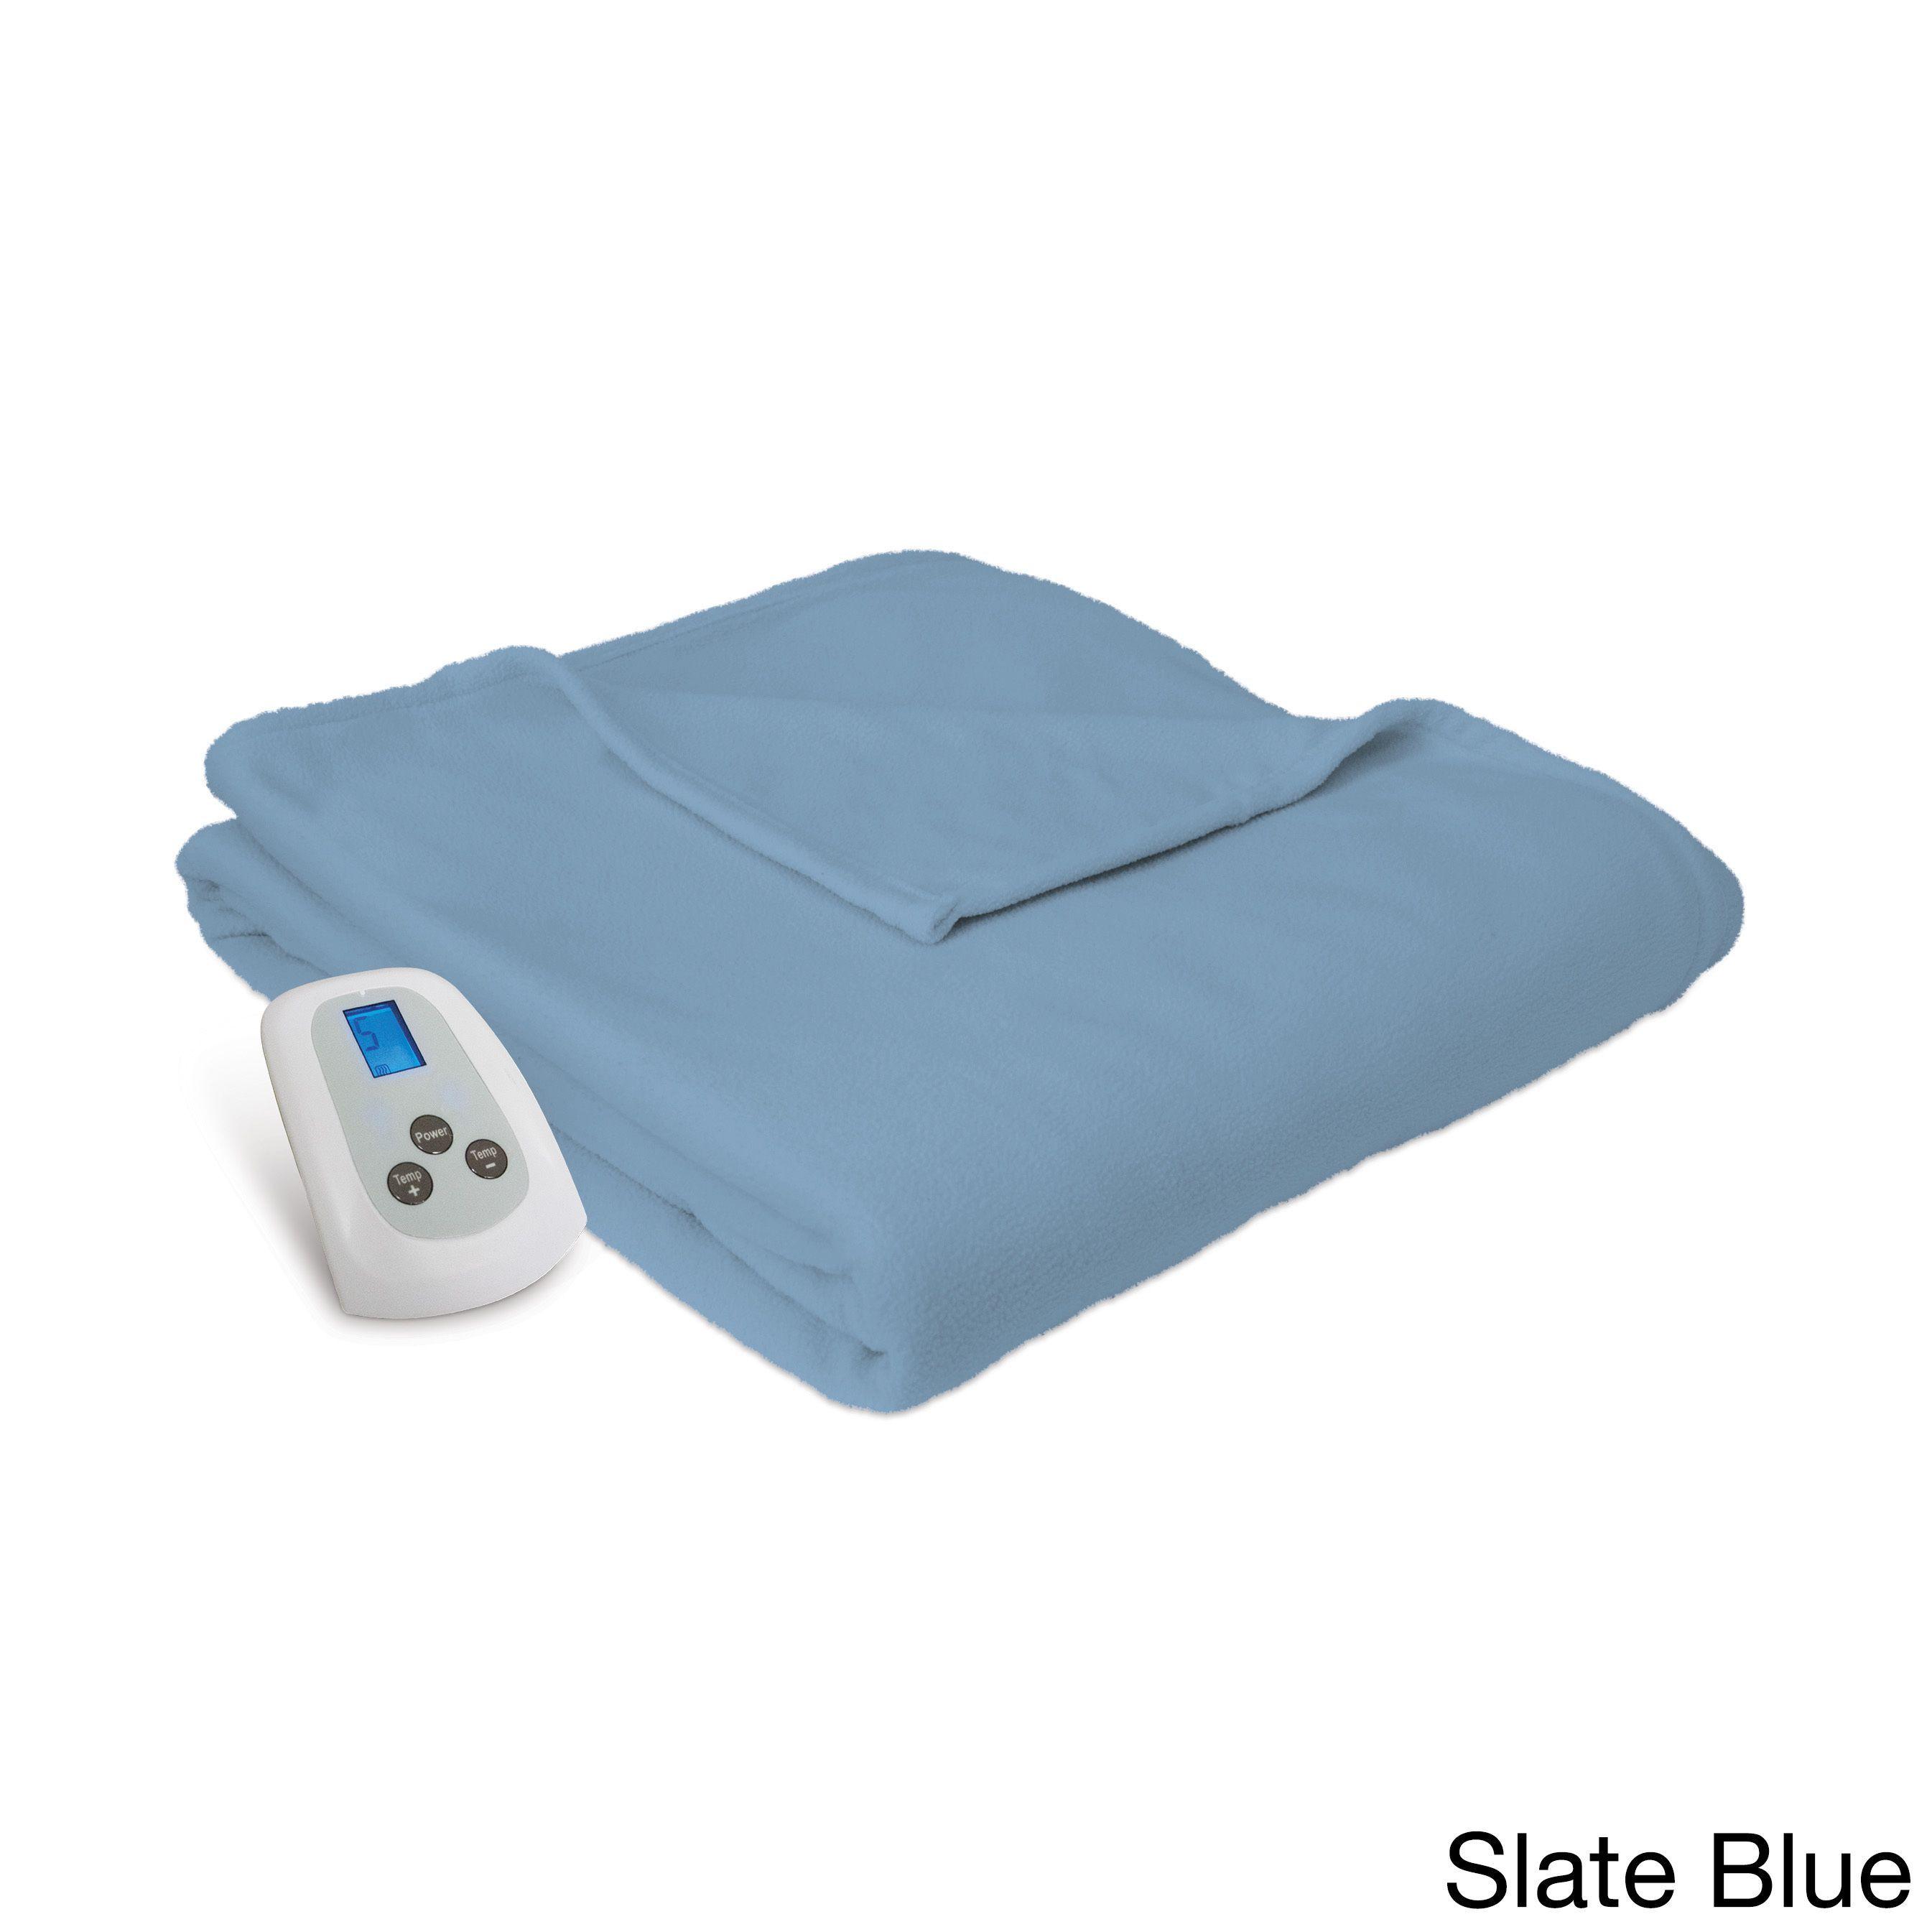 Serta Microfleece Heated Electric Warming Blanket With